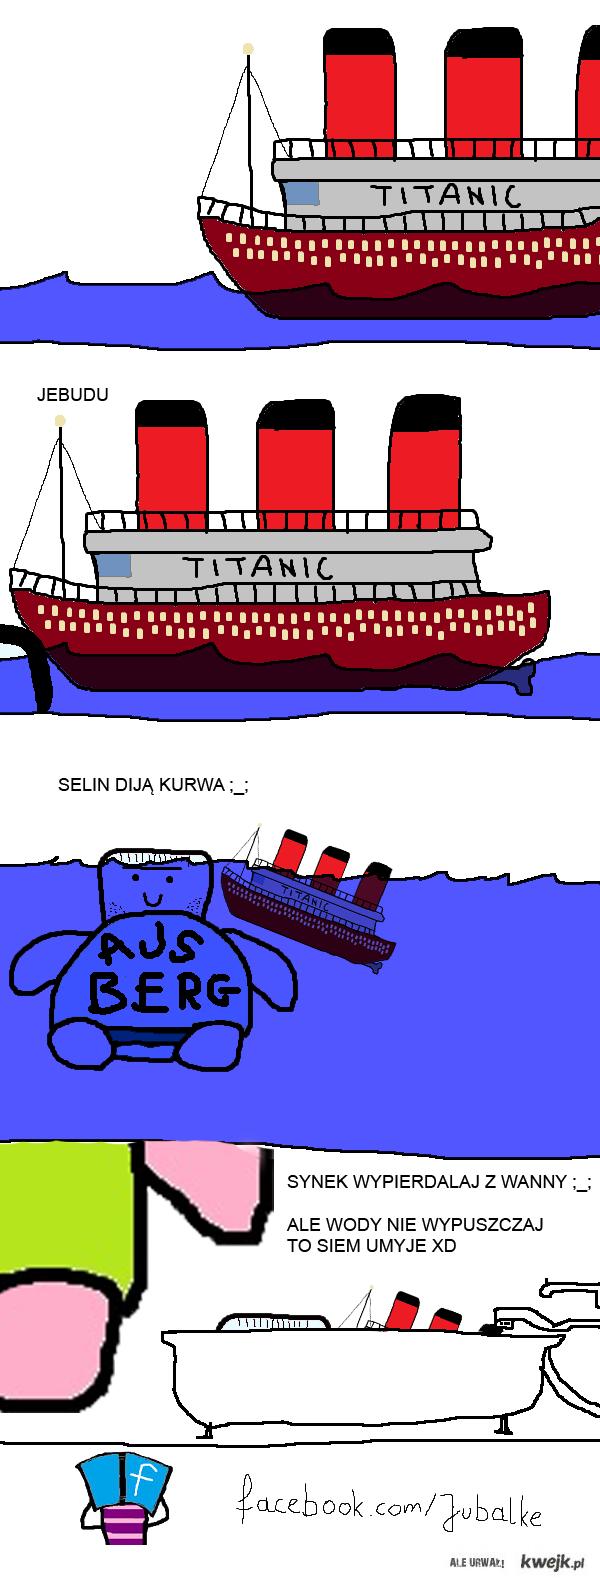 Jubałke